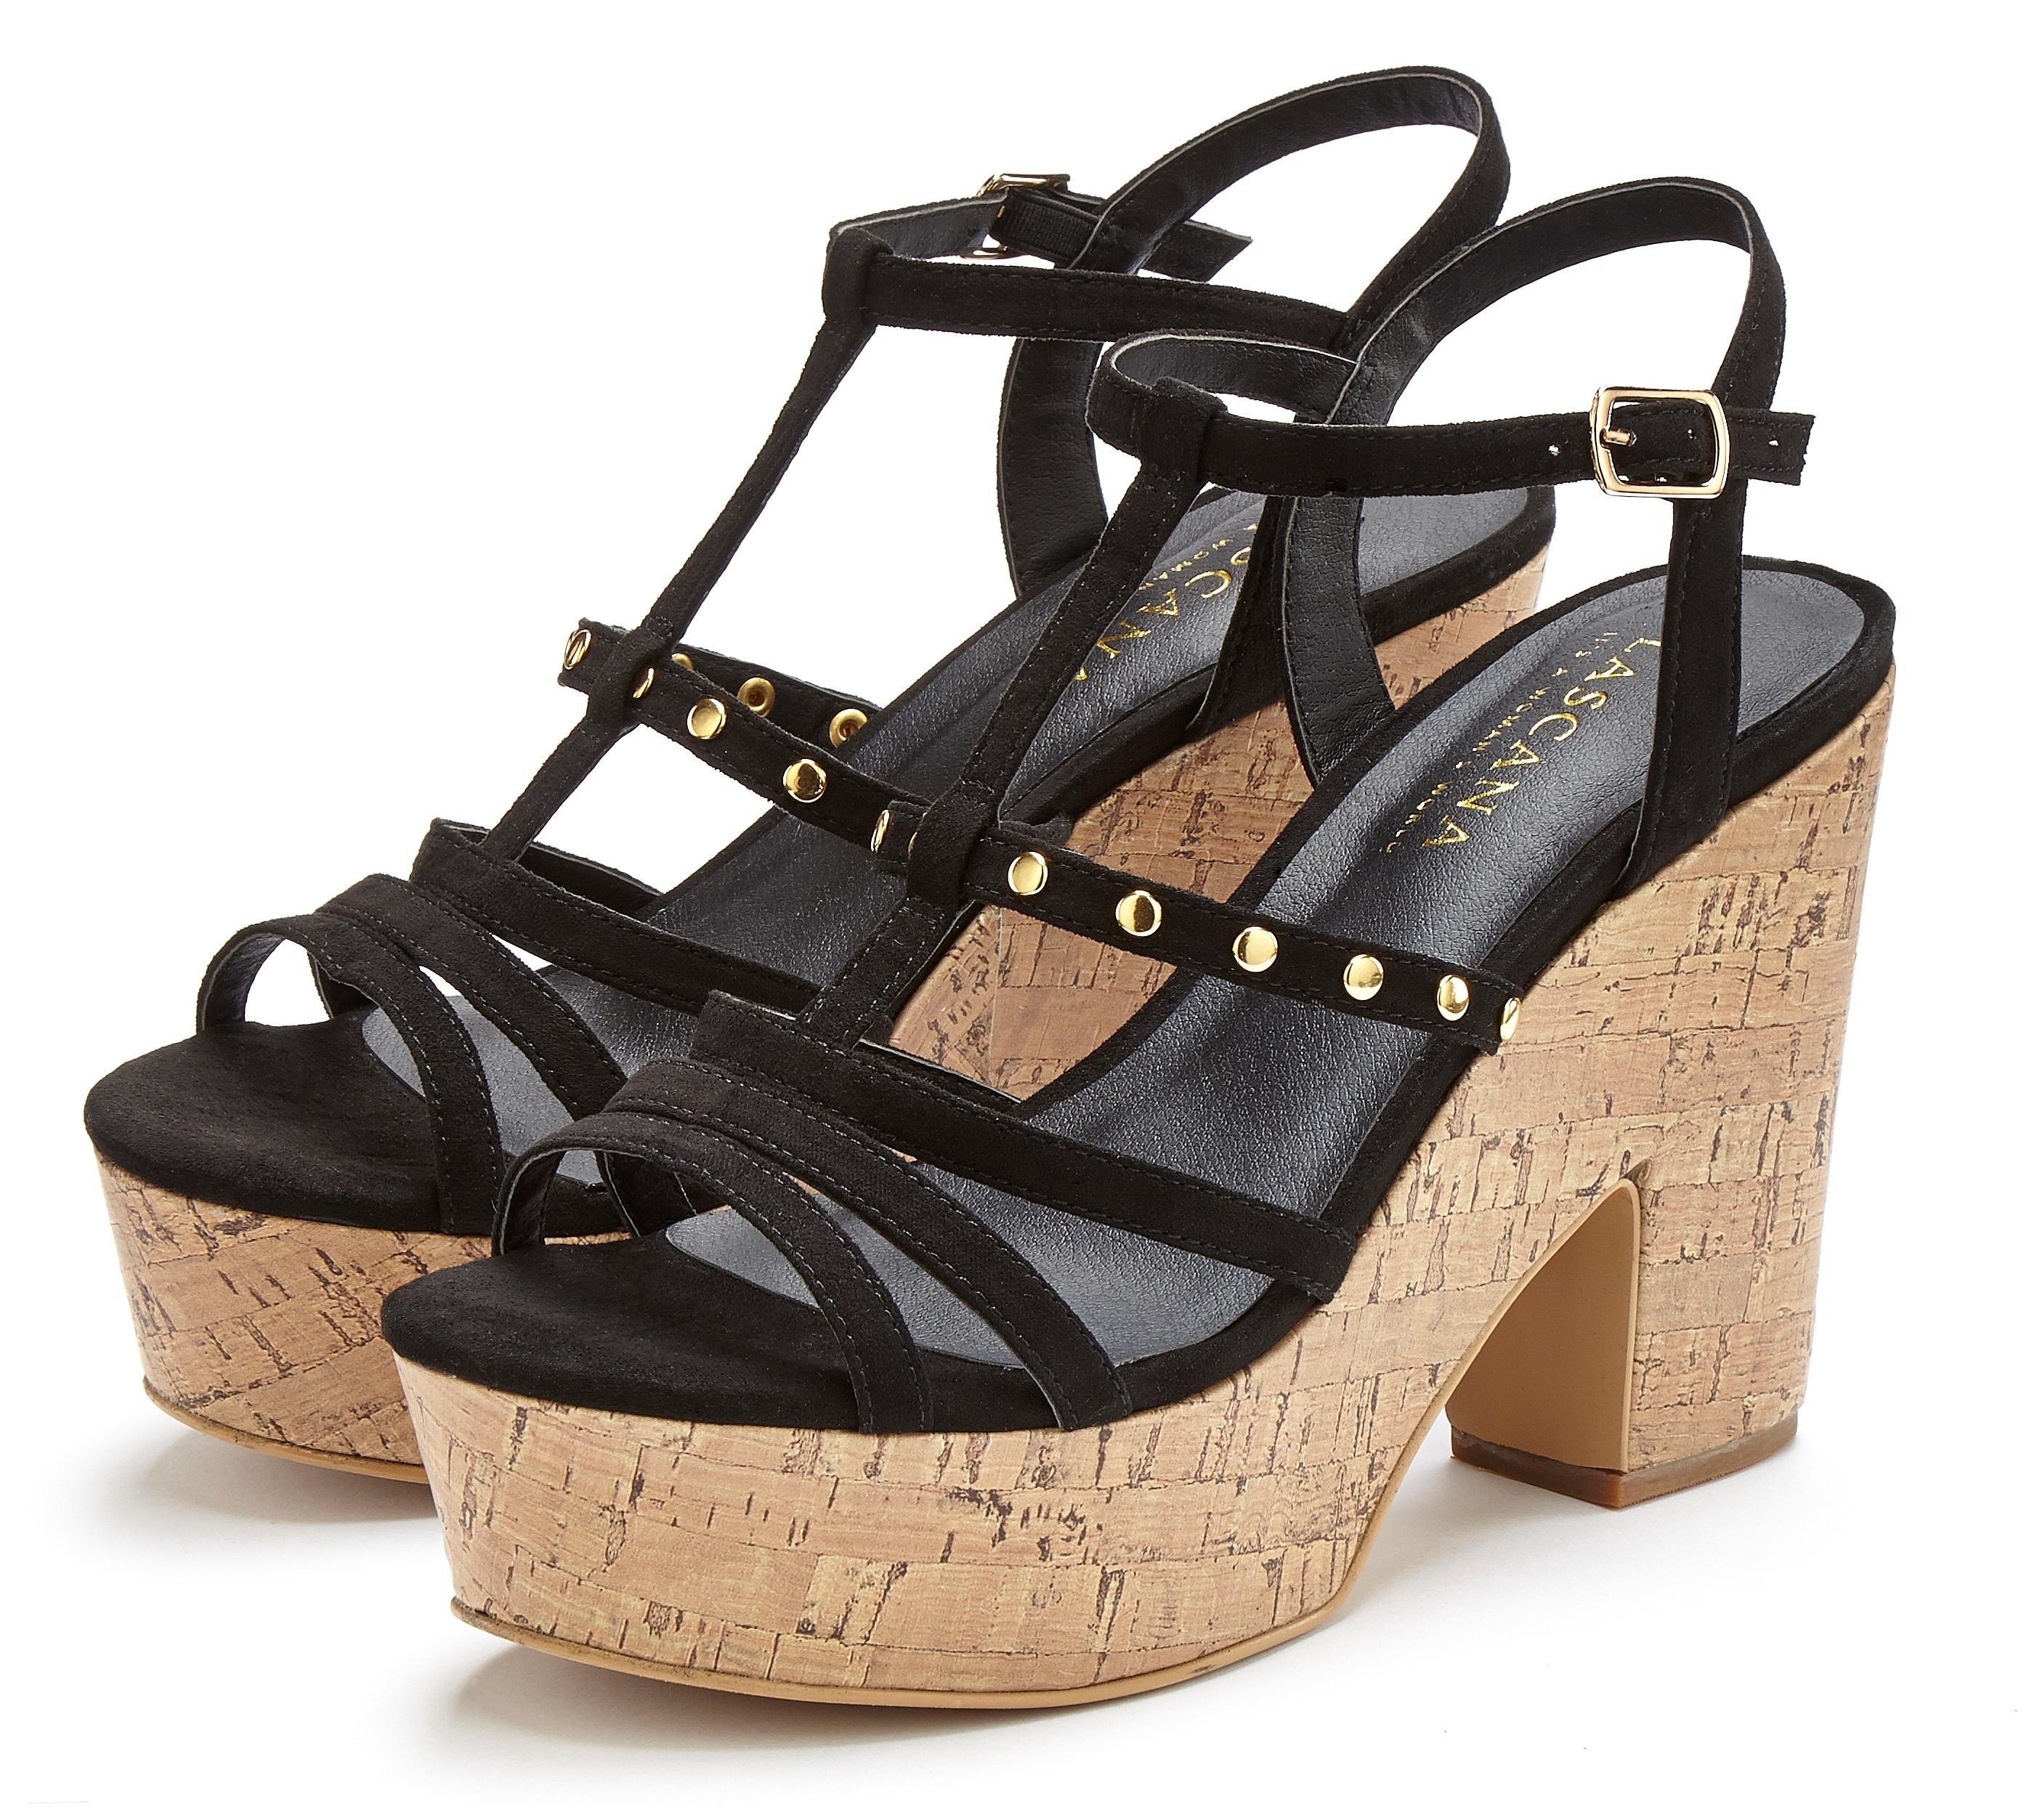 LASCANA highheel-sandaaltjes nu online kopen bij Lascana